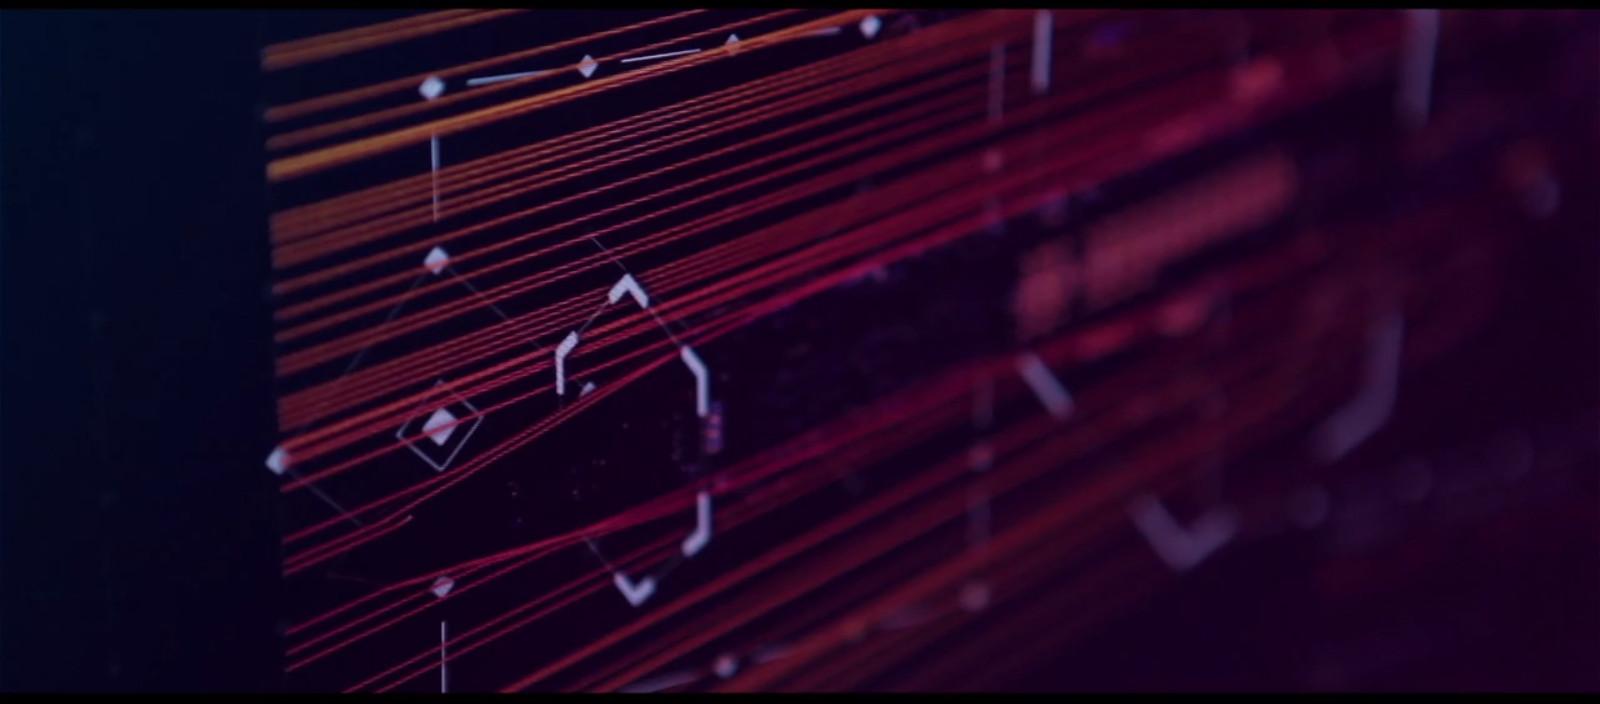 image : vimeo